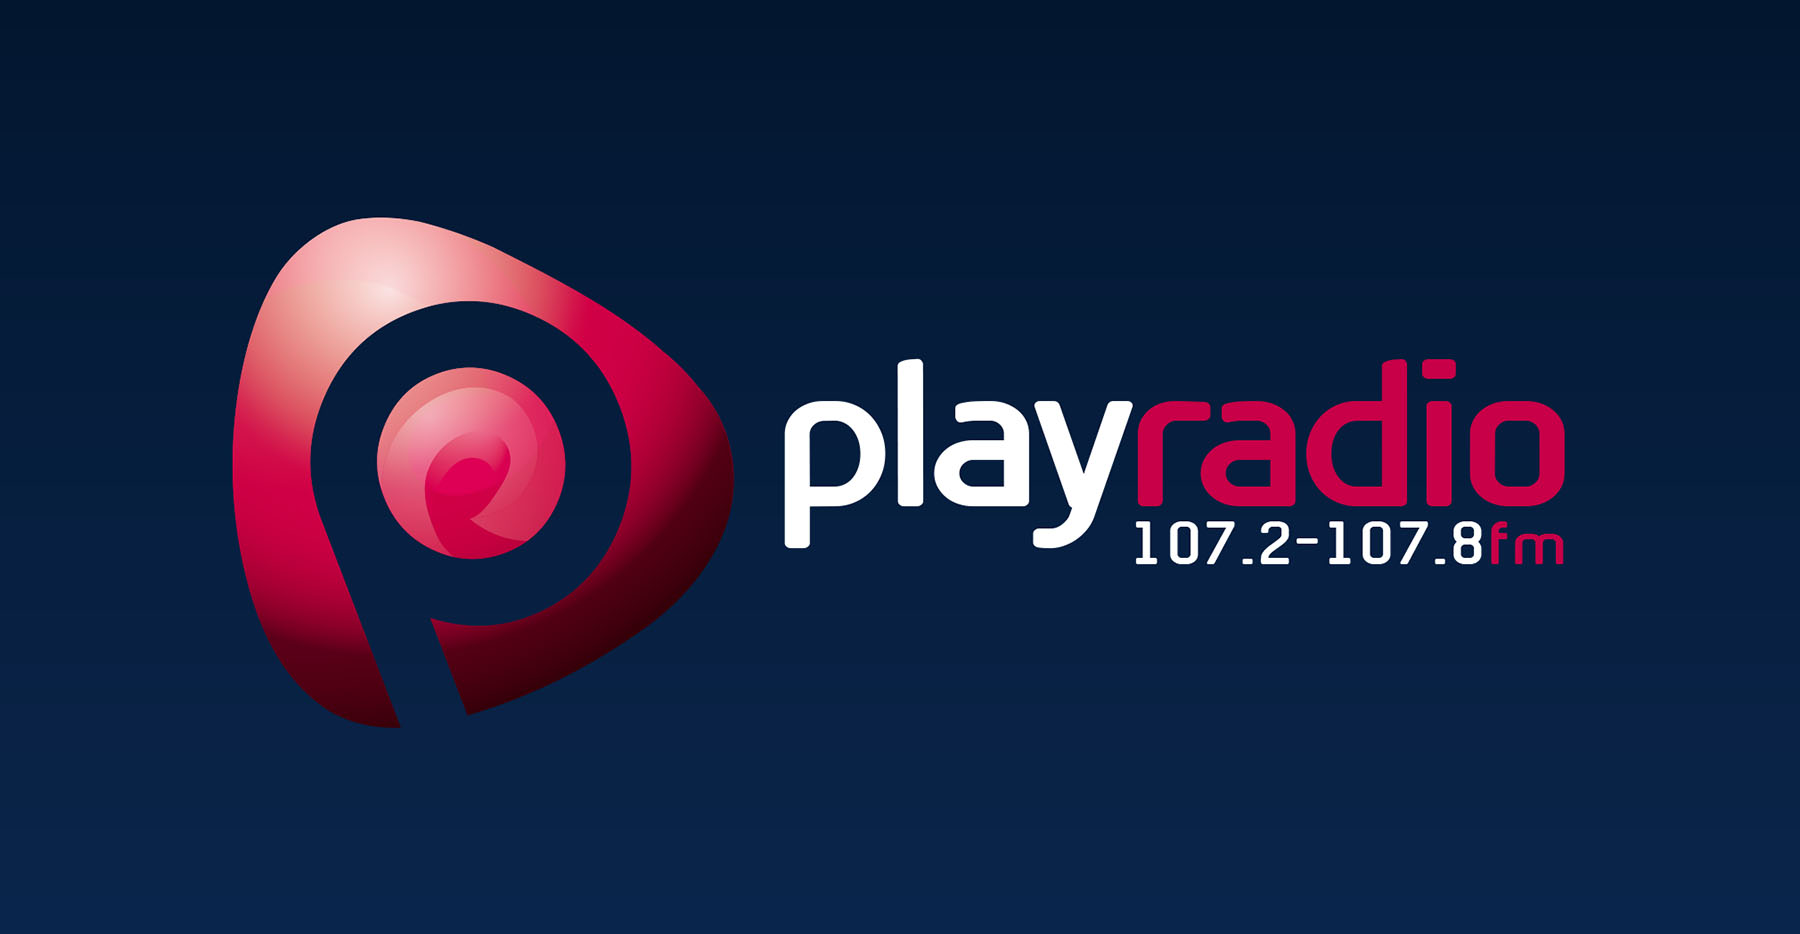 News from the Czech Republic  Radio Prague